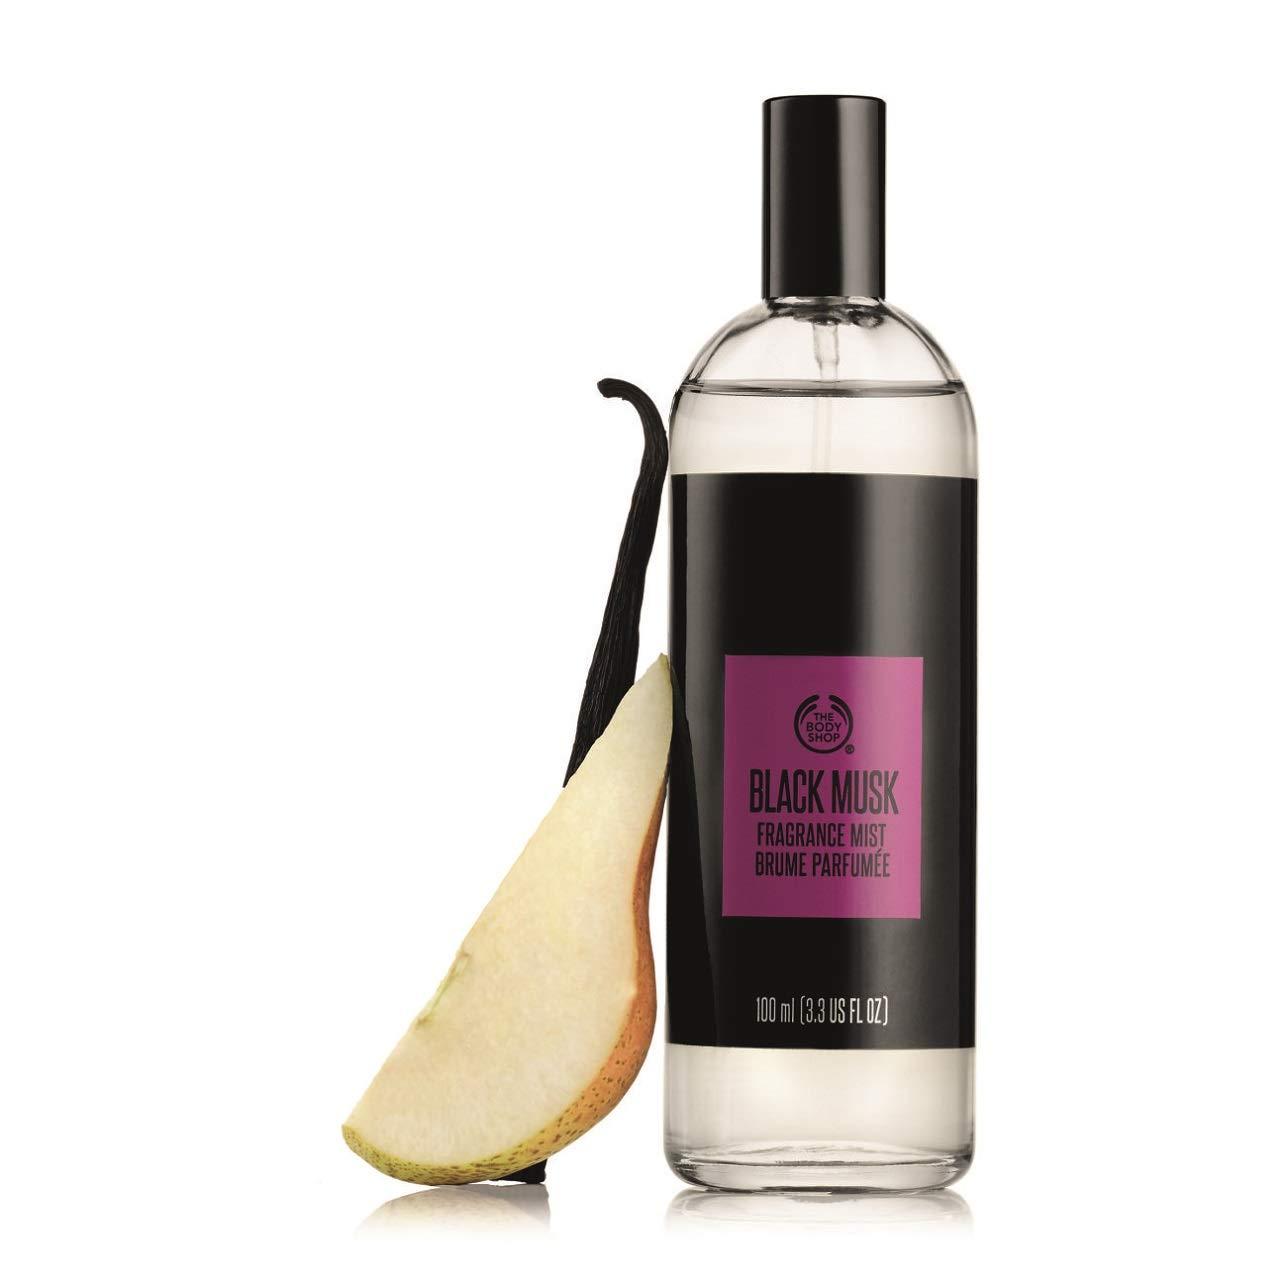 Amazon.com : The Body Shop Fijian Water Lotus Fragrance Mist, 3.3 Fluid Ounce : Beauty